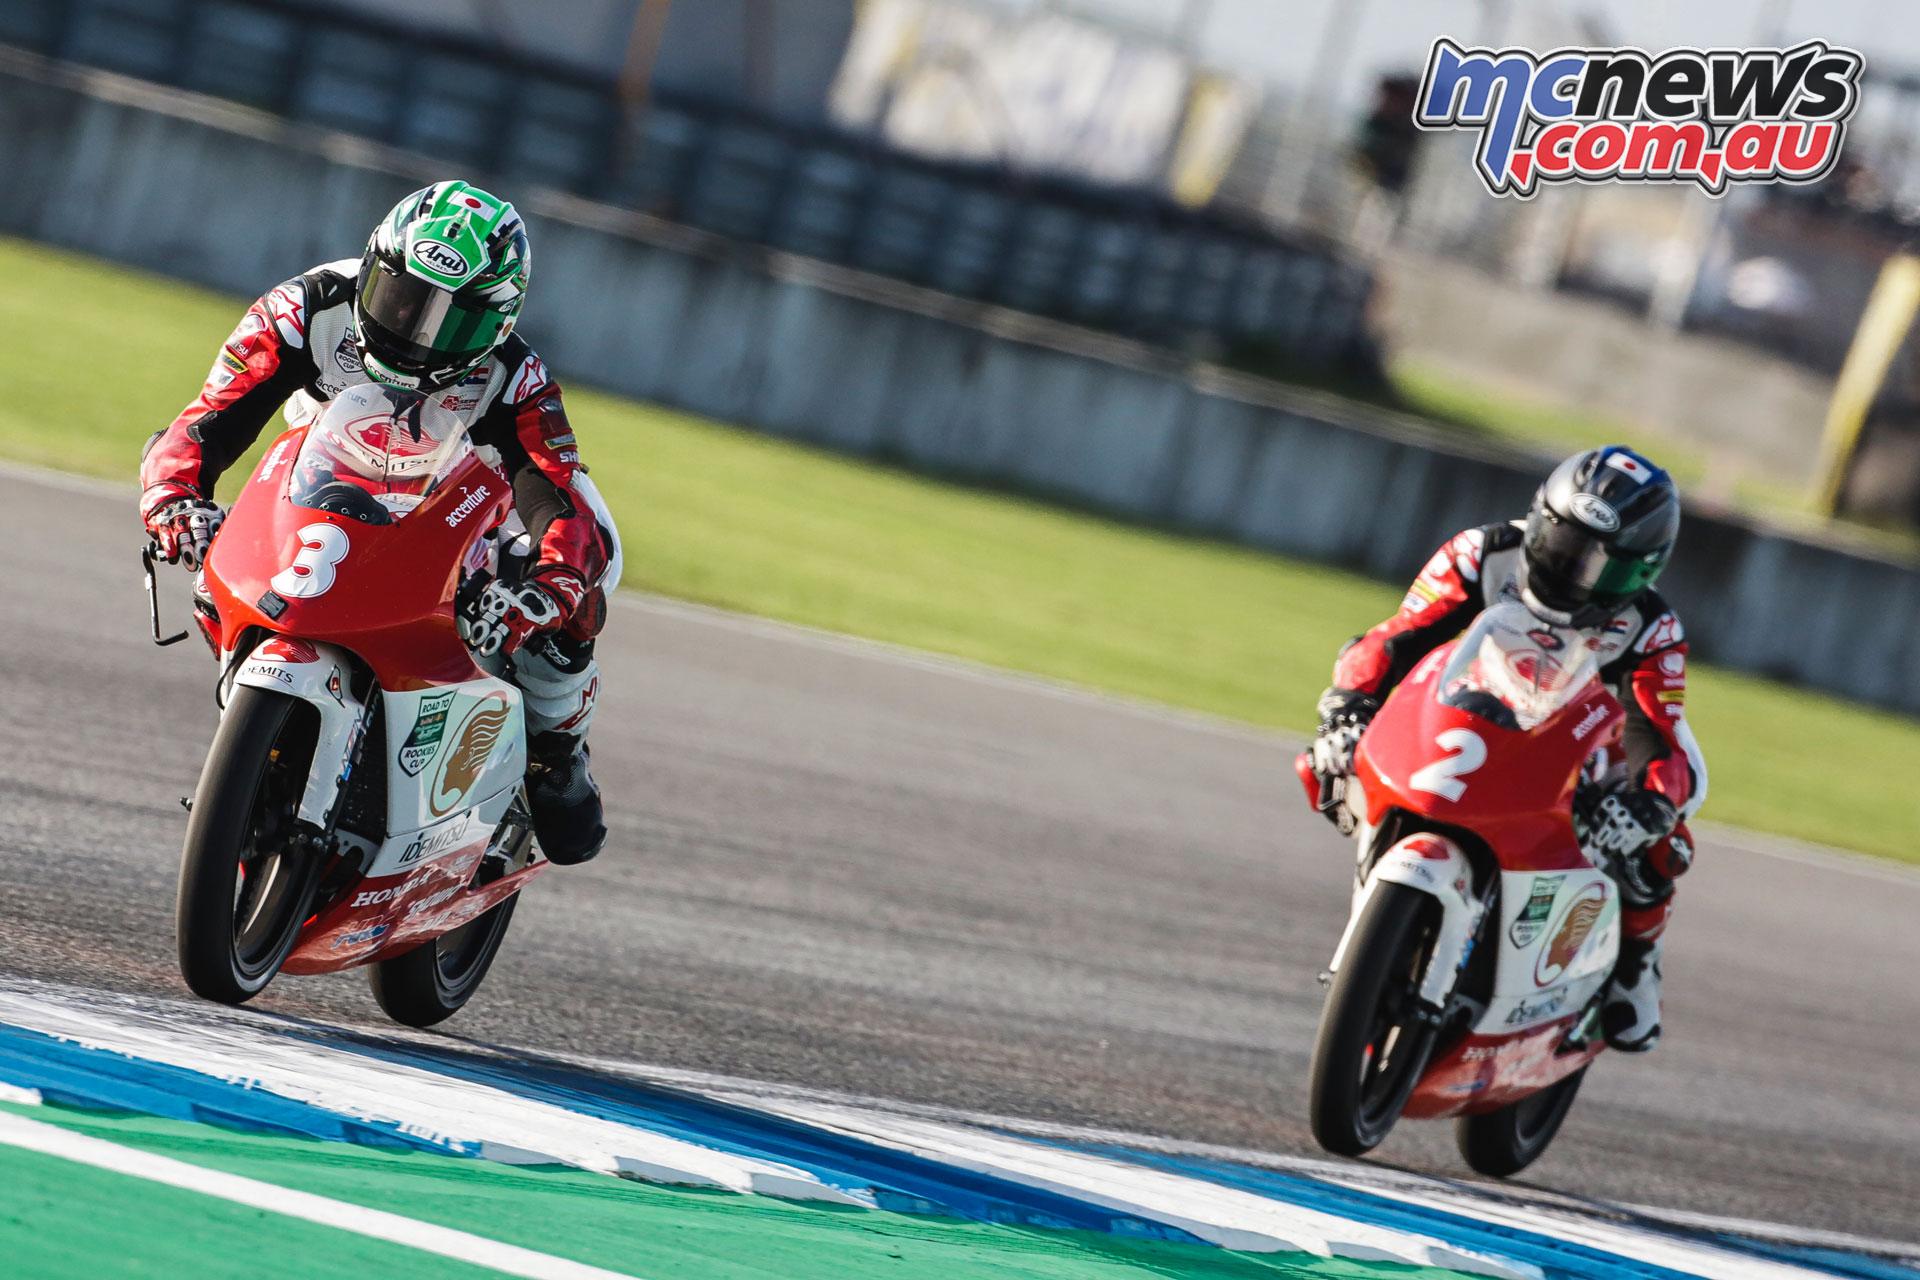 ATC Rnd Thailand Sho Nishimura Race ZA